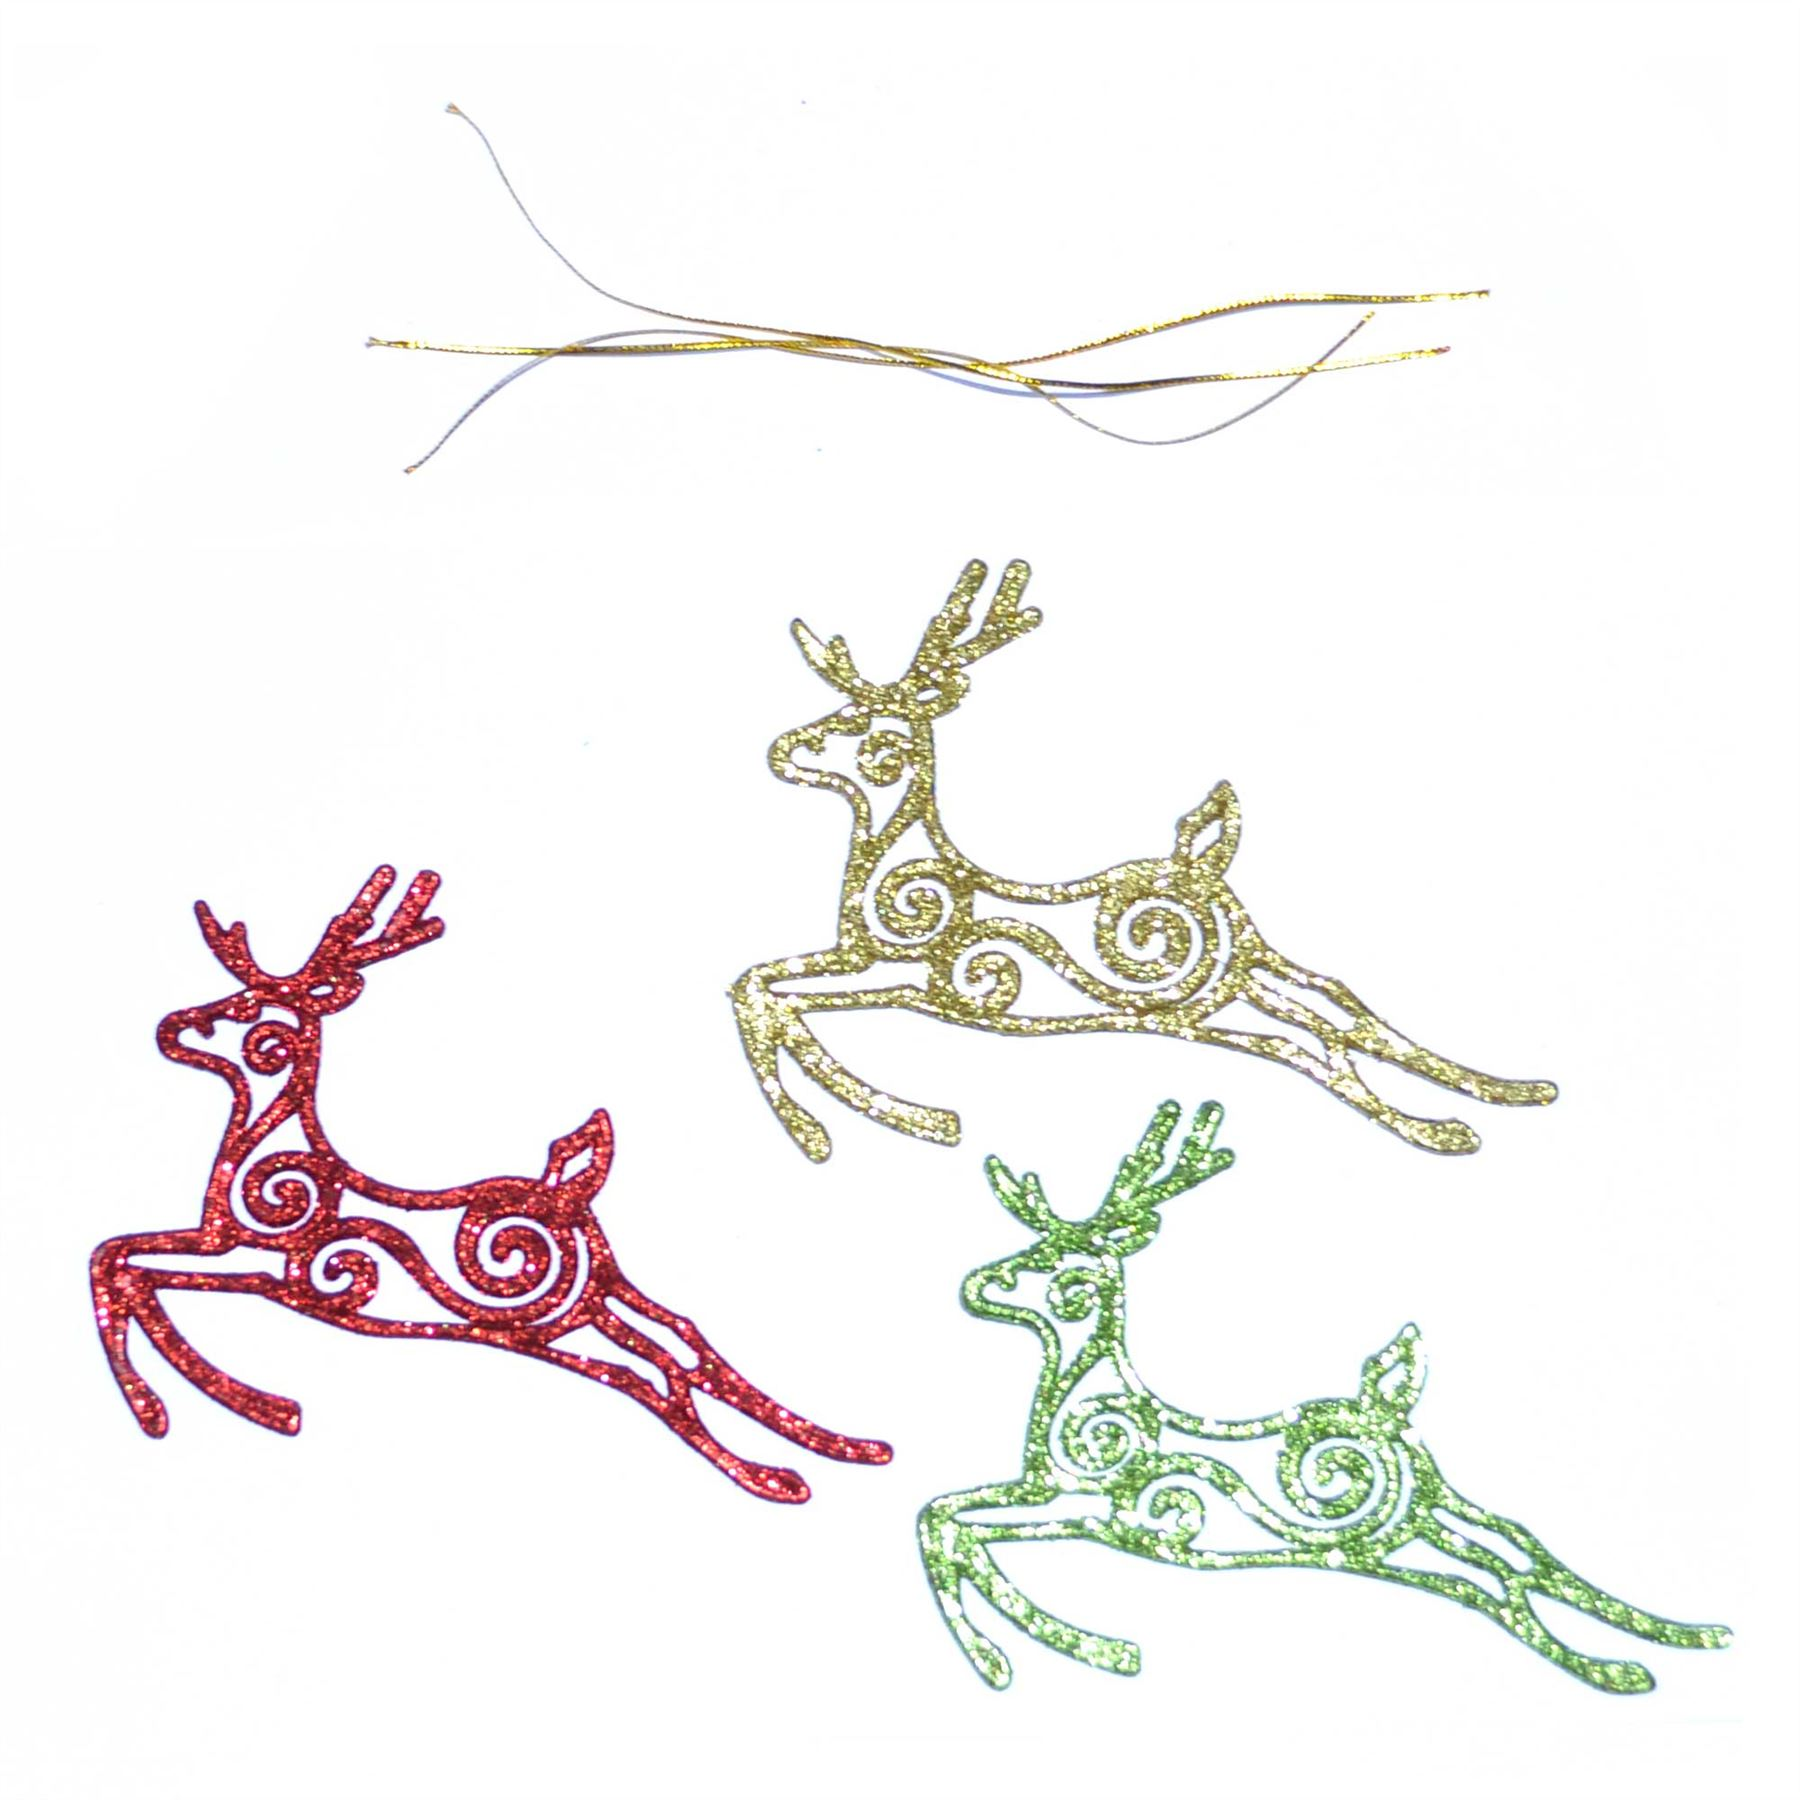 Christmas-Tree-Hanging-Decorations-Glitter-Snowman-Xmas-Beads-Chain-Garland thumbnail 7